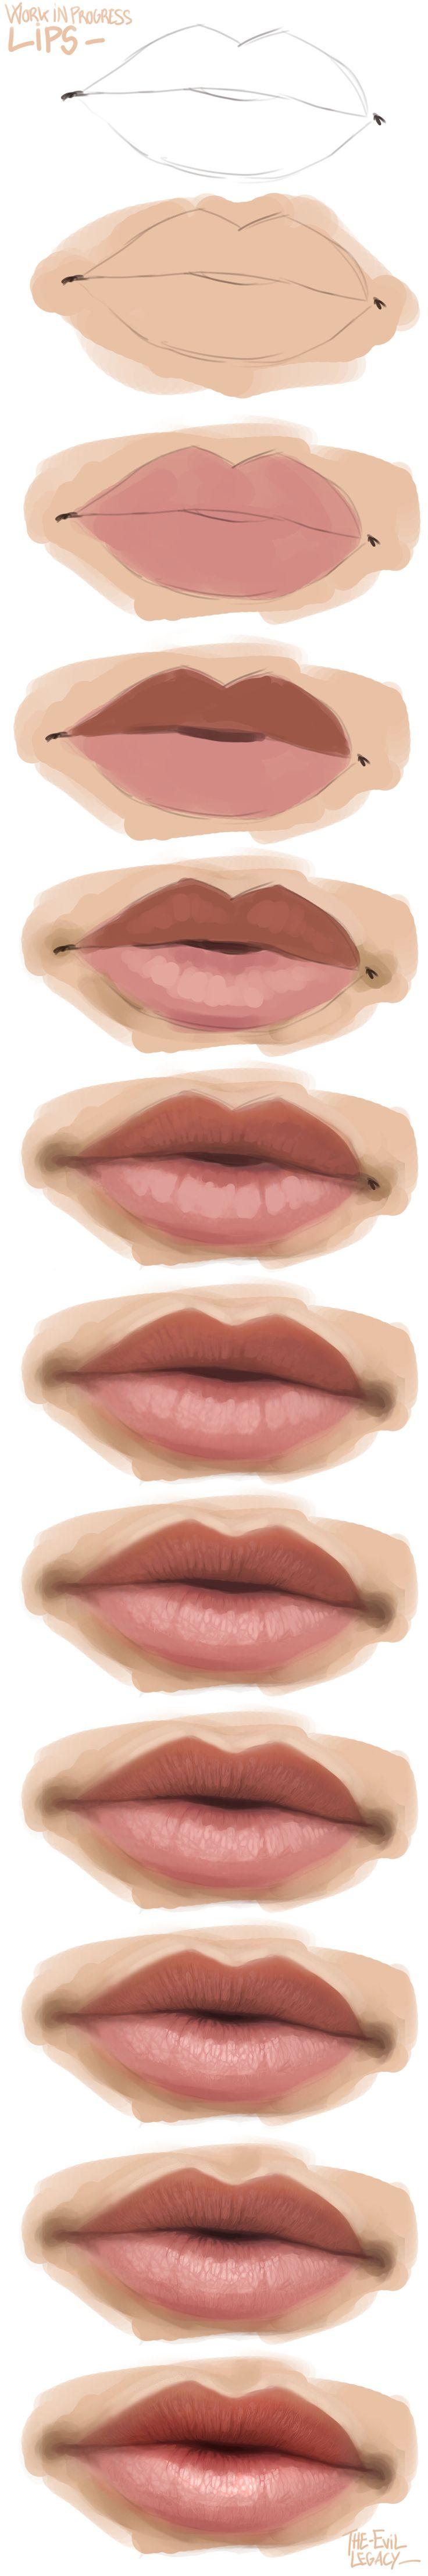 wip - lips by the-evil-legacy.deviantart.com on @deviantART